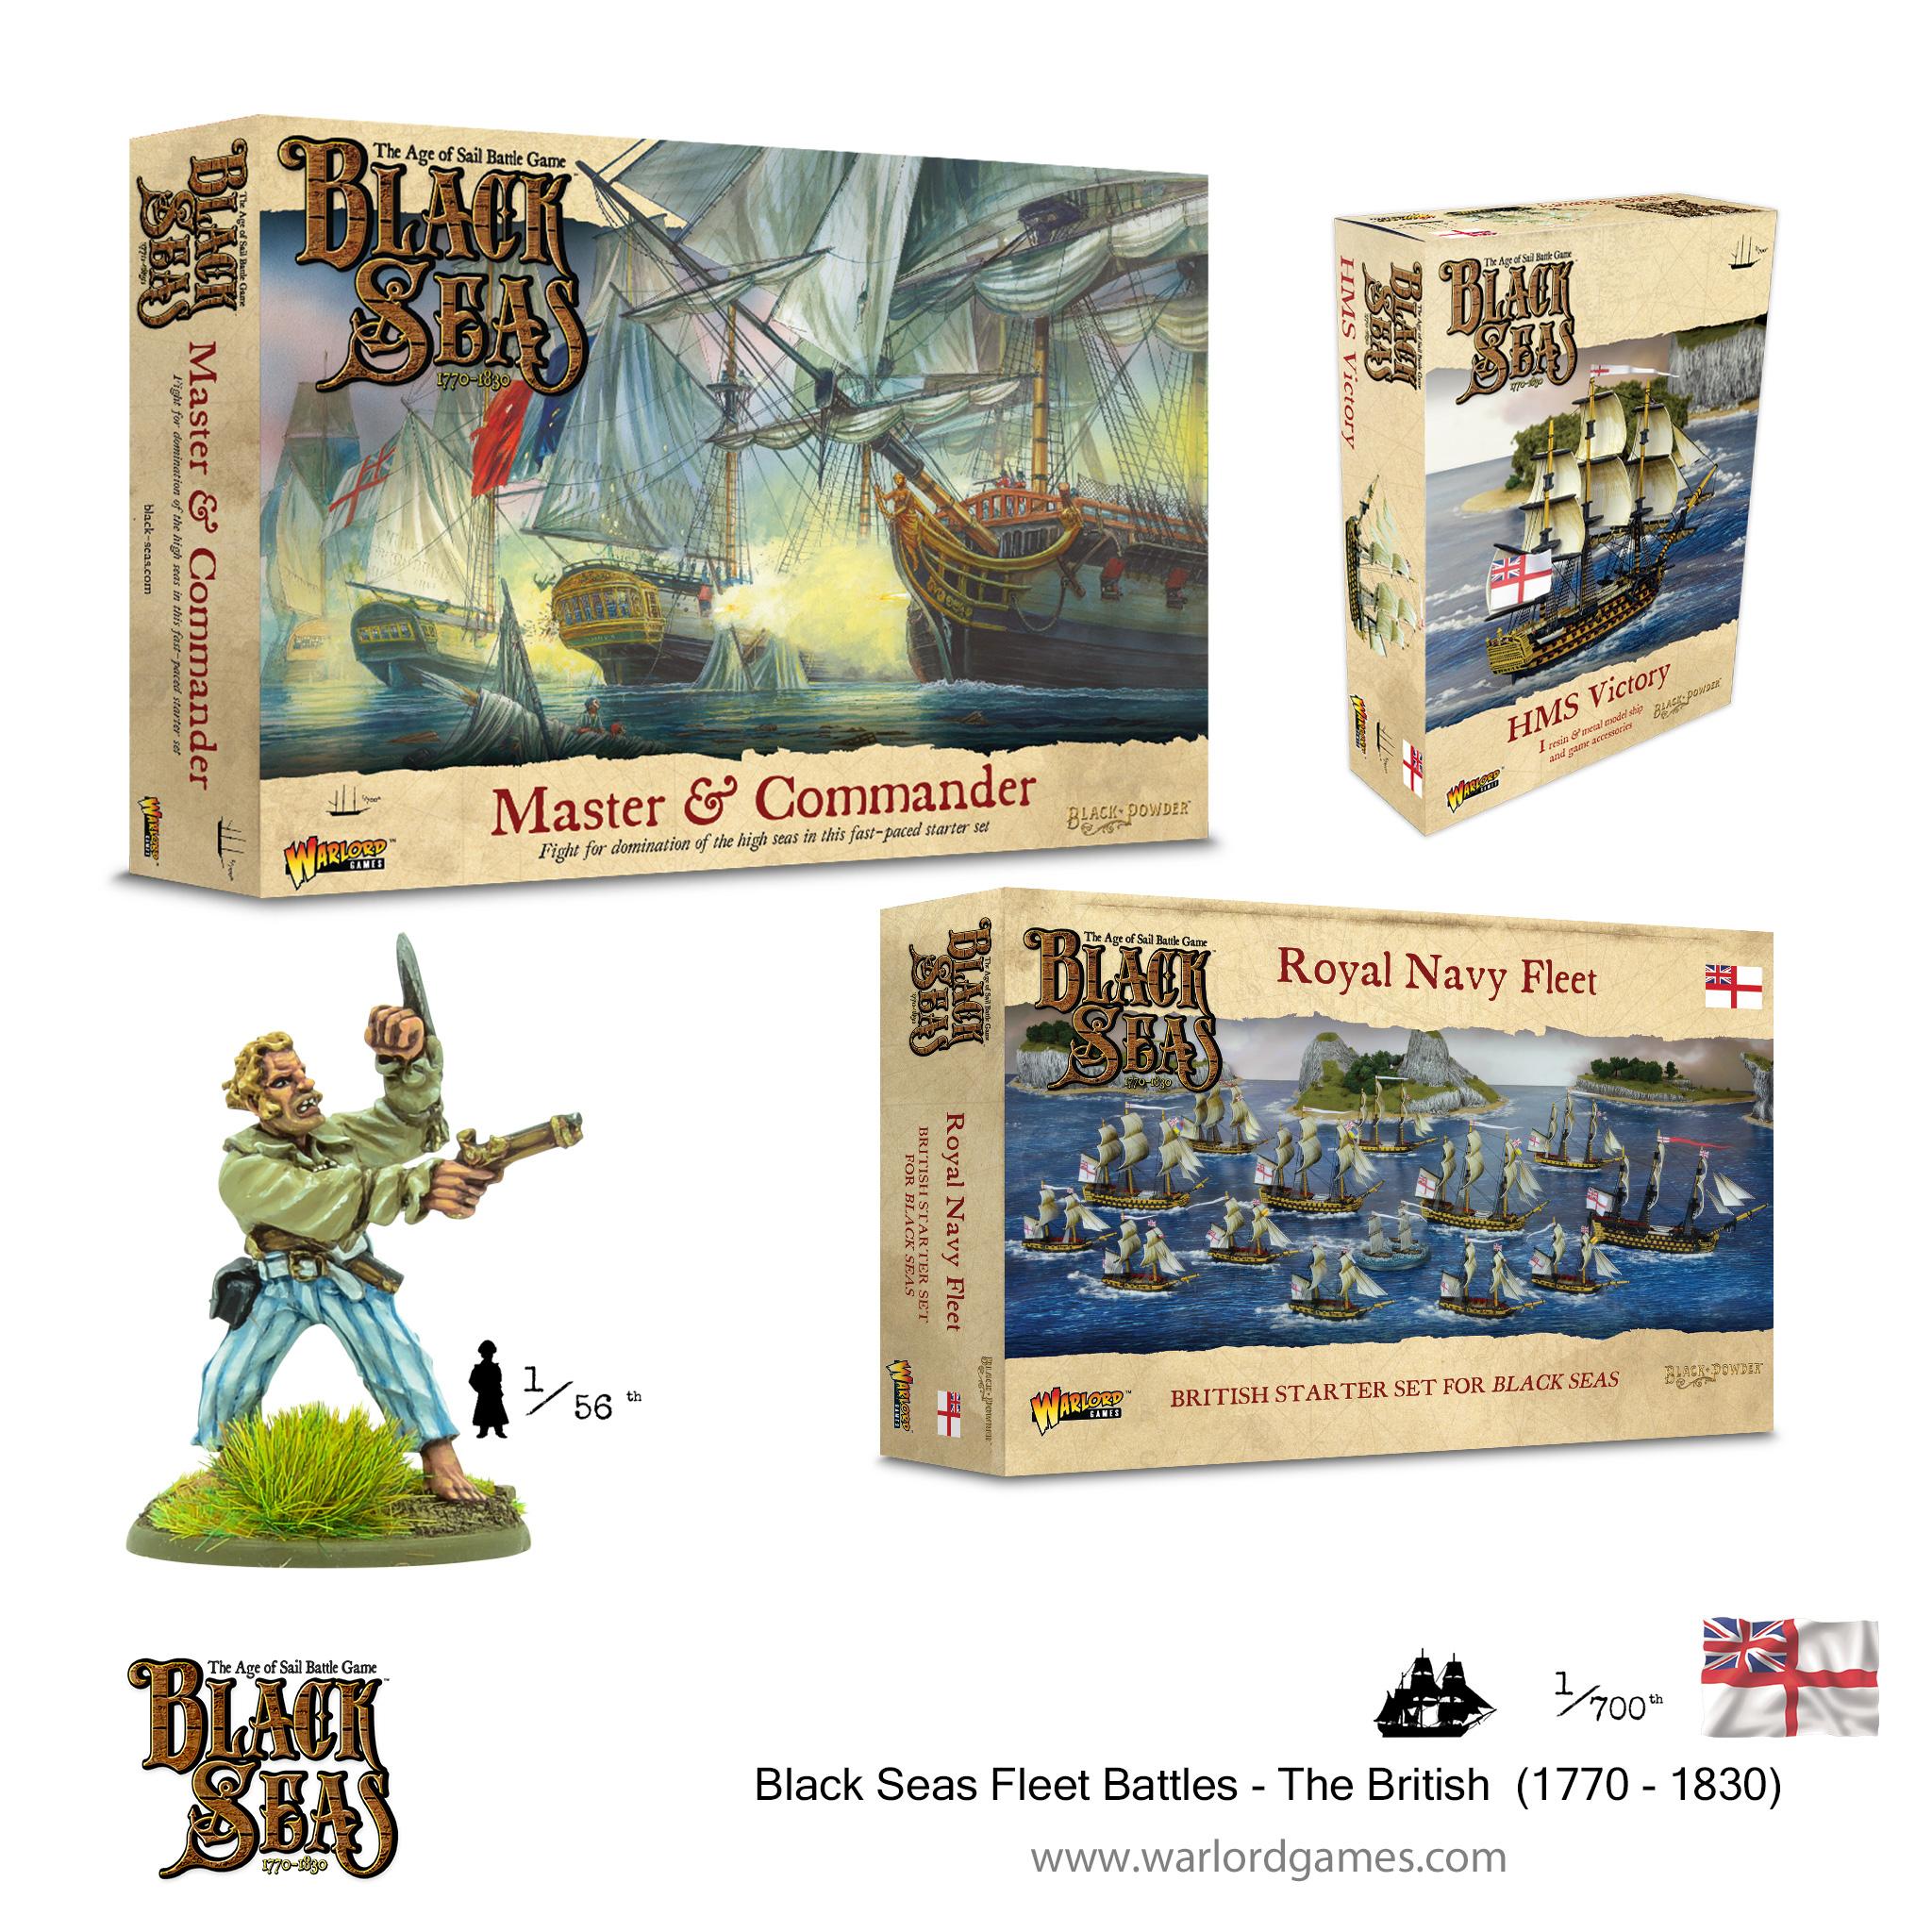 Black Seas Fleet Battles - The British (1770 - 1830)